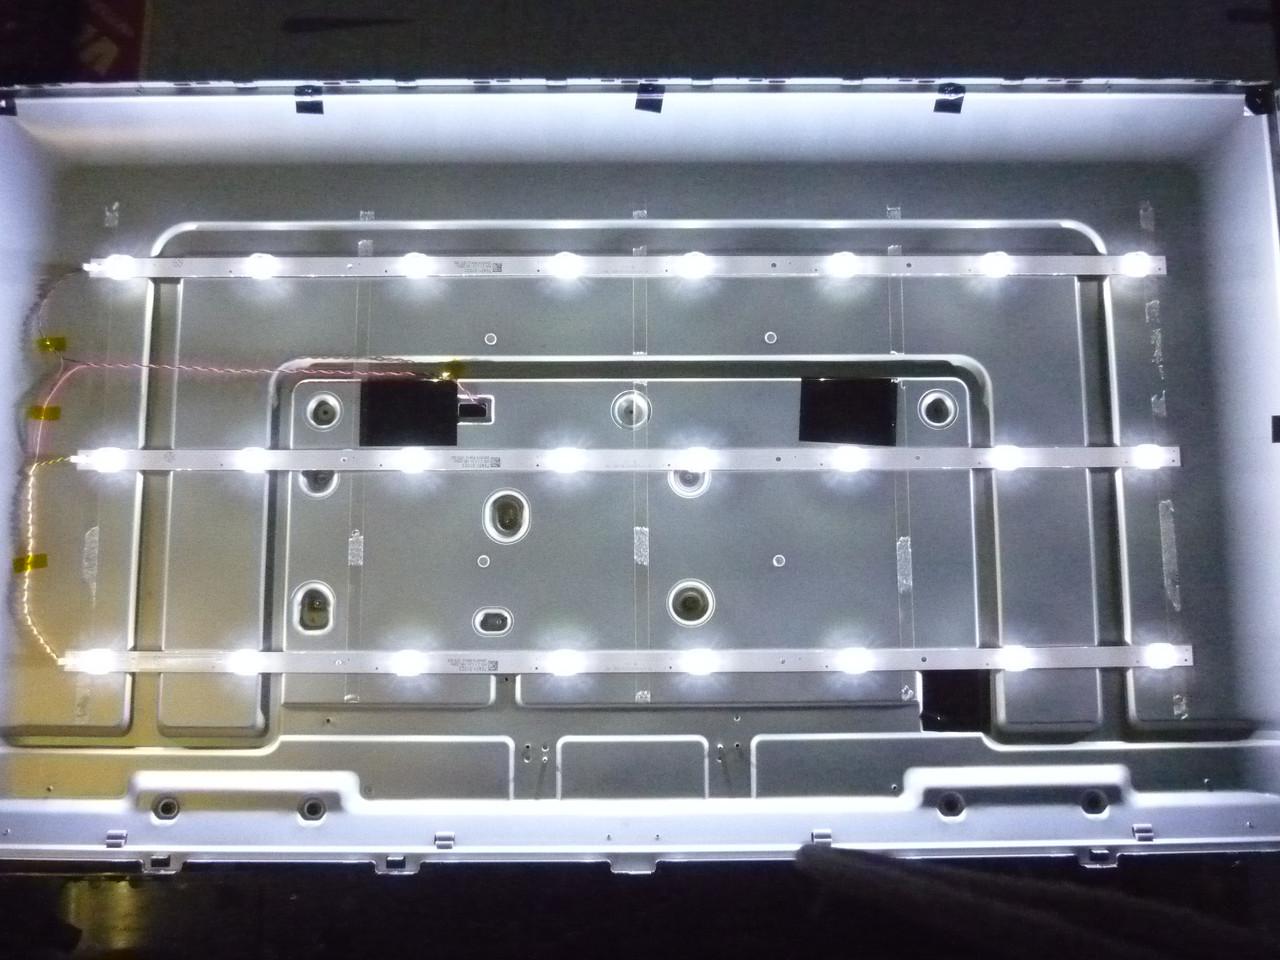 Светодиодные LED-линейки RF-FP430008SE30-0801 (матрица MODEL: TV19170101).